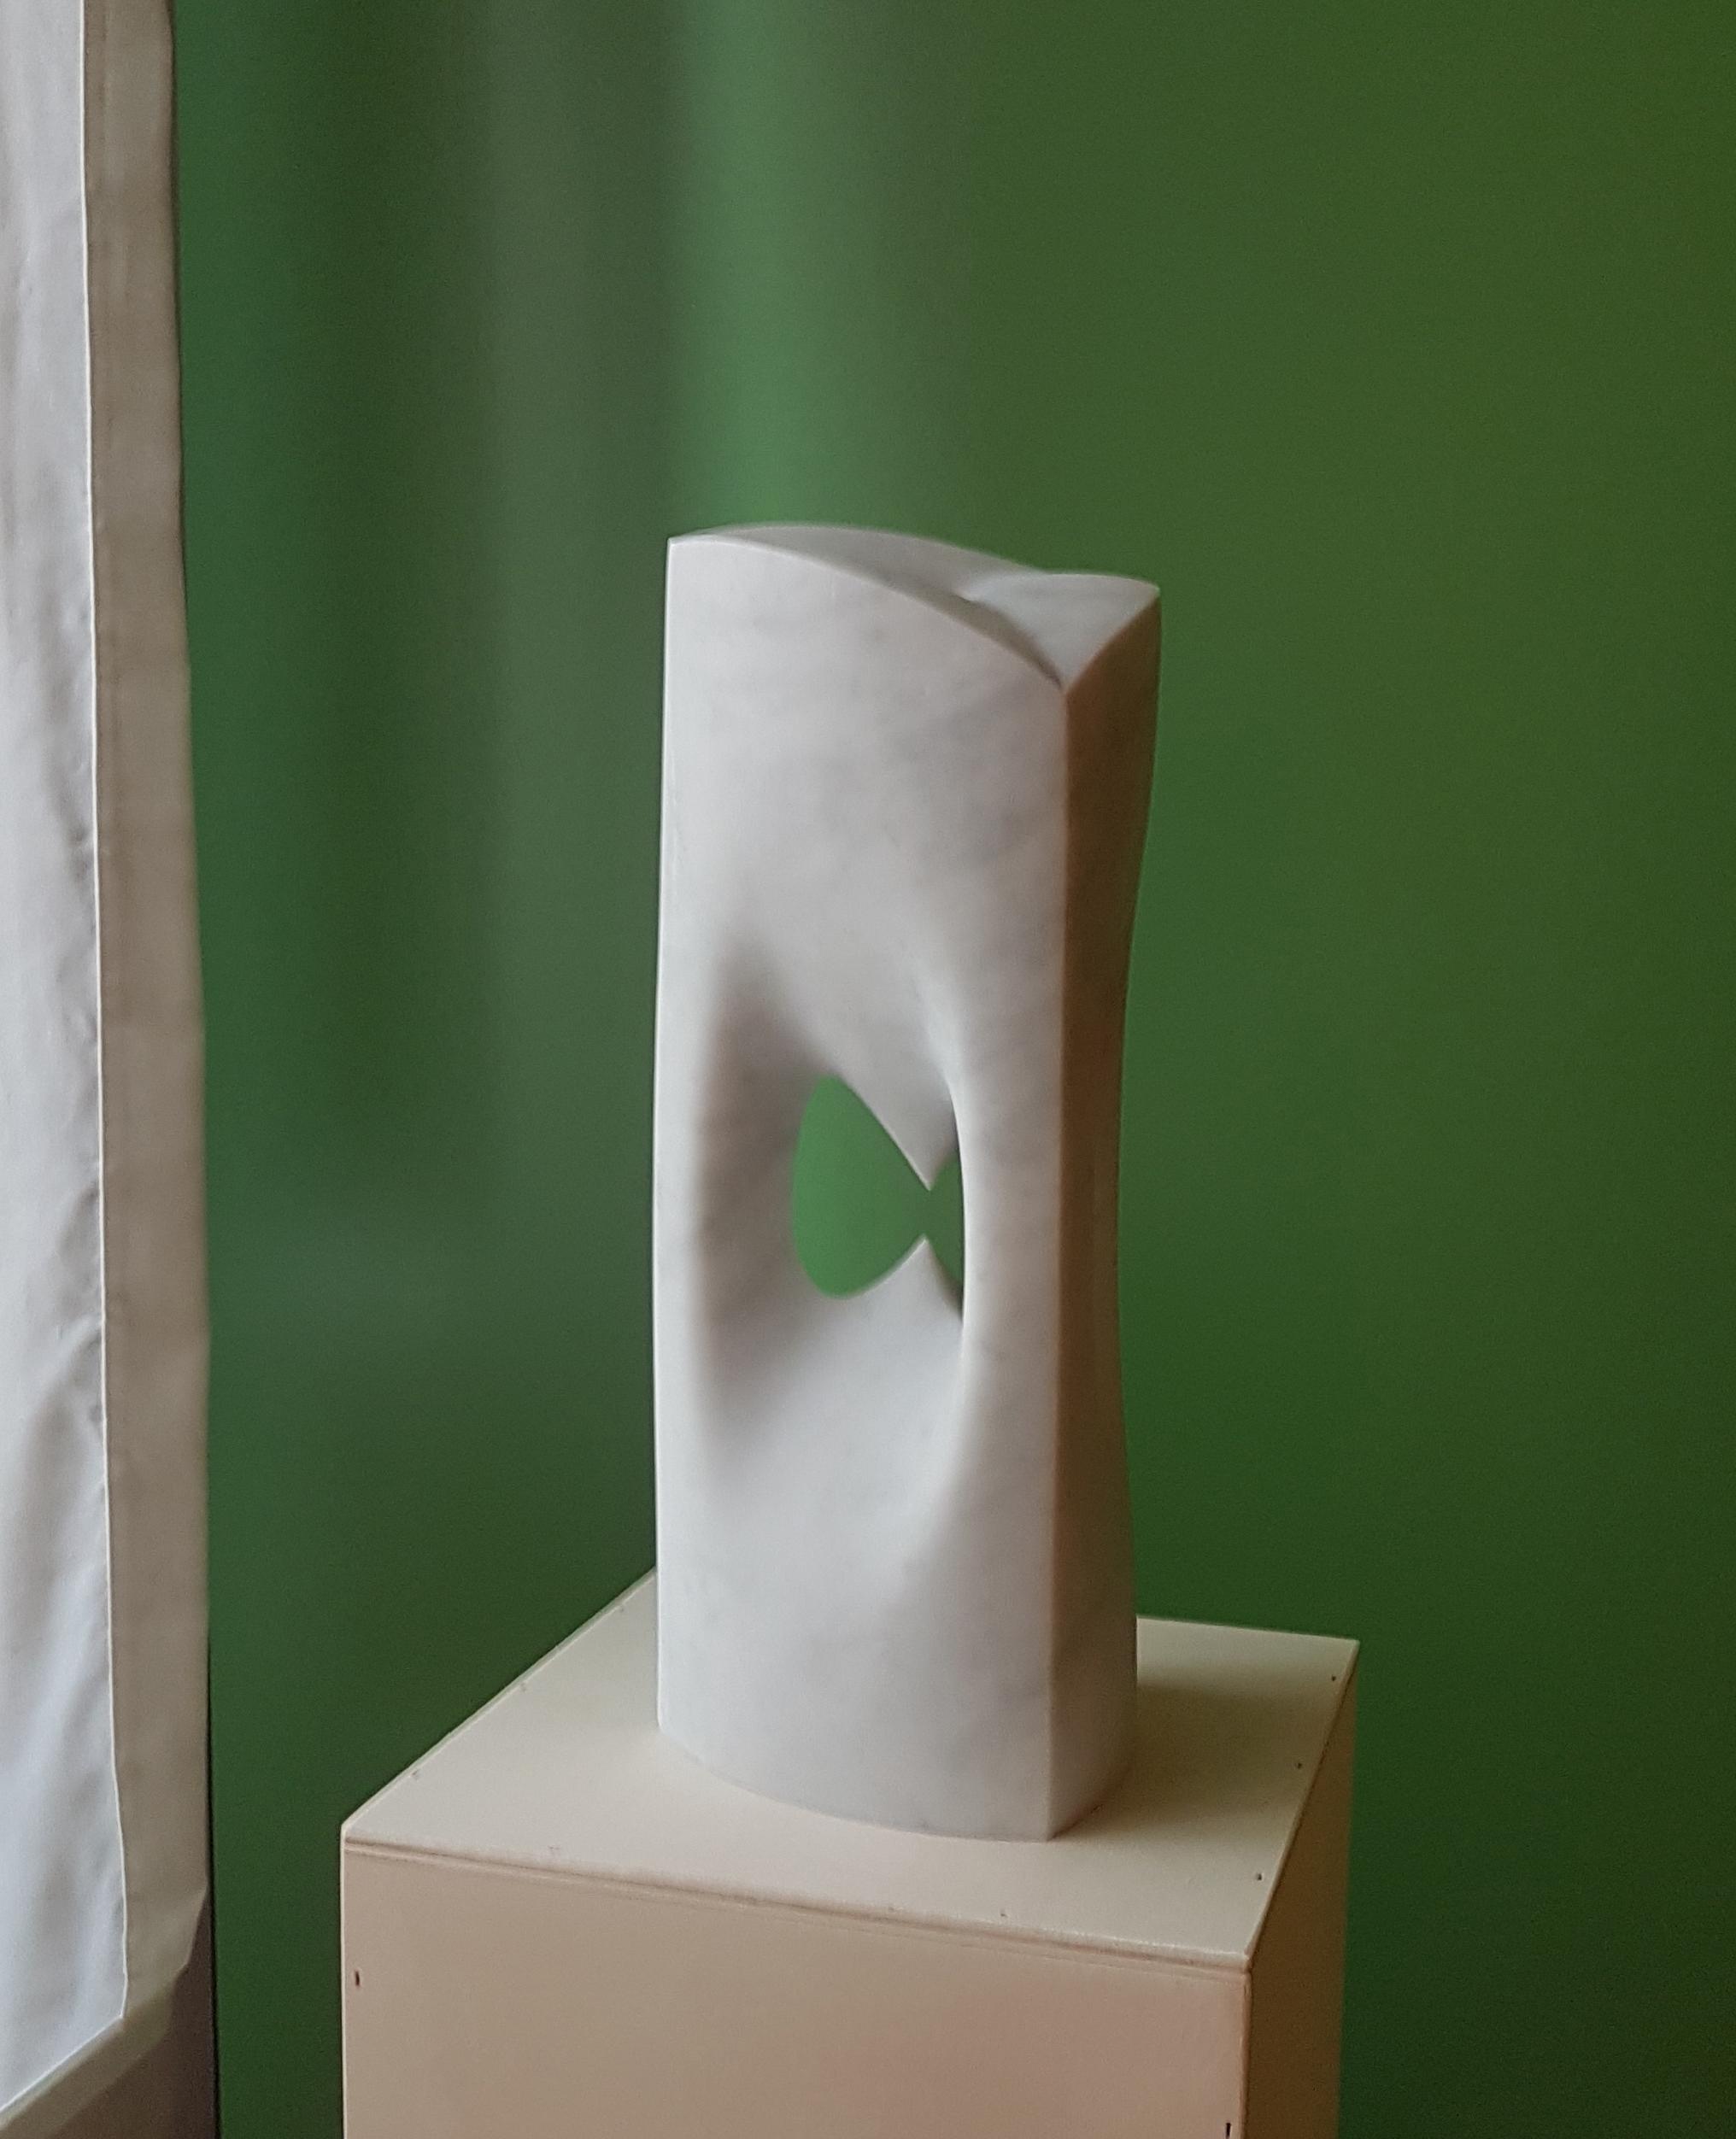 Clepsydra - h 45 cm  Carrara marble  2014